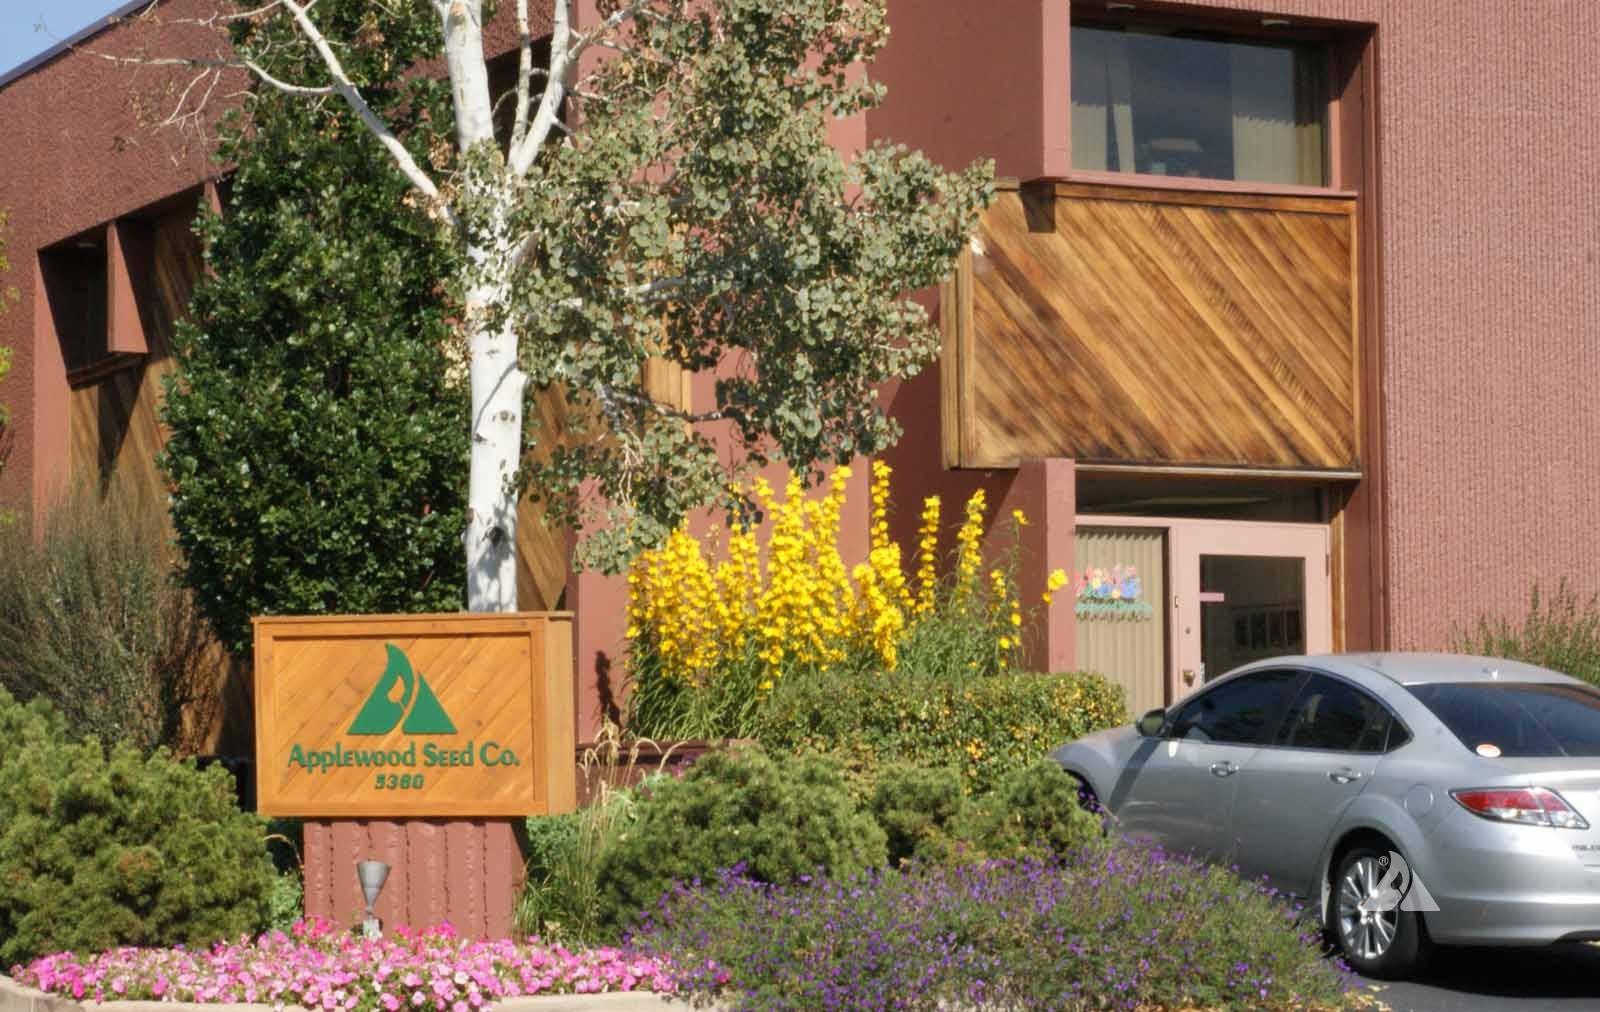 Applewood Seed Company Single Post Image